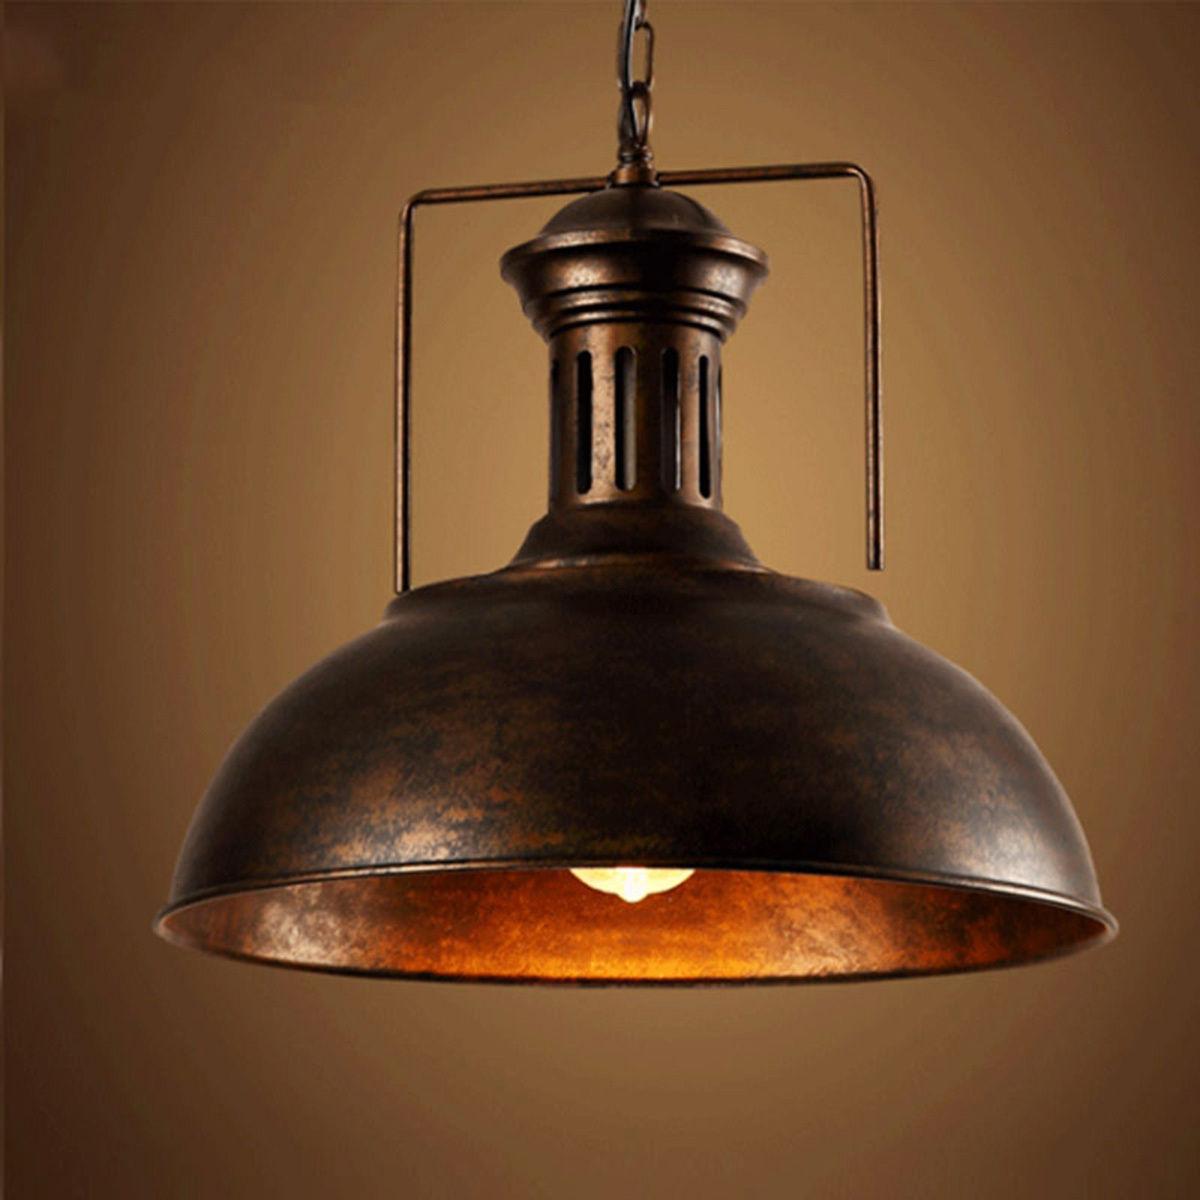 Details About Pendant Light Ceiling Lamp Fixture Vintage Rustic Warehouse Lighting